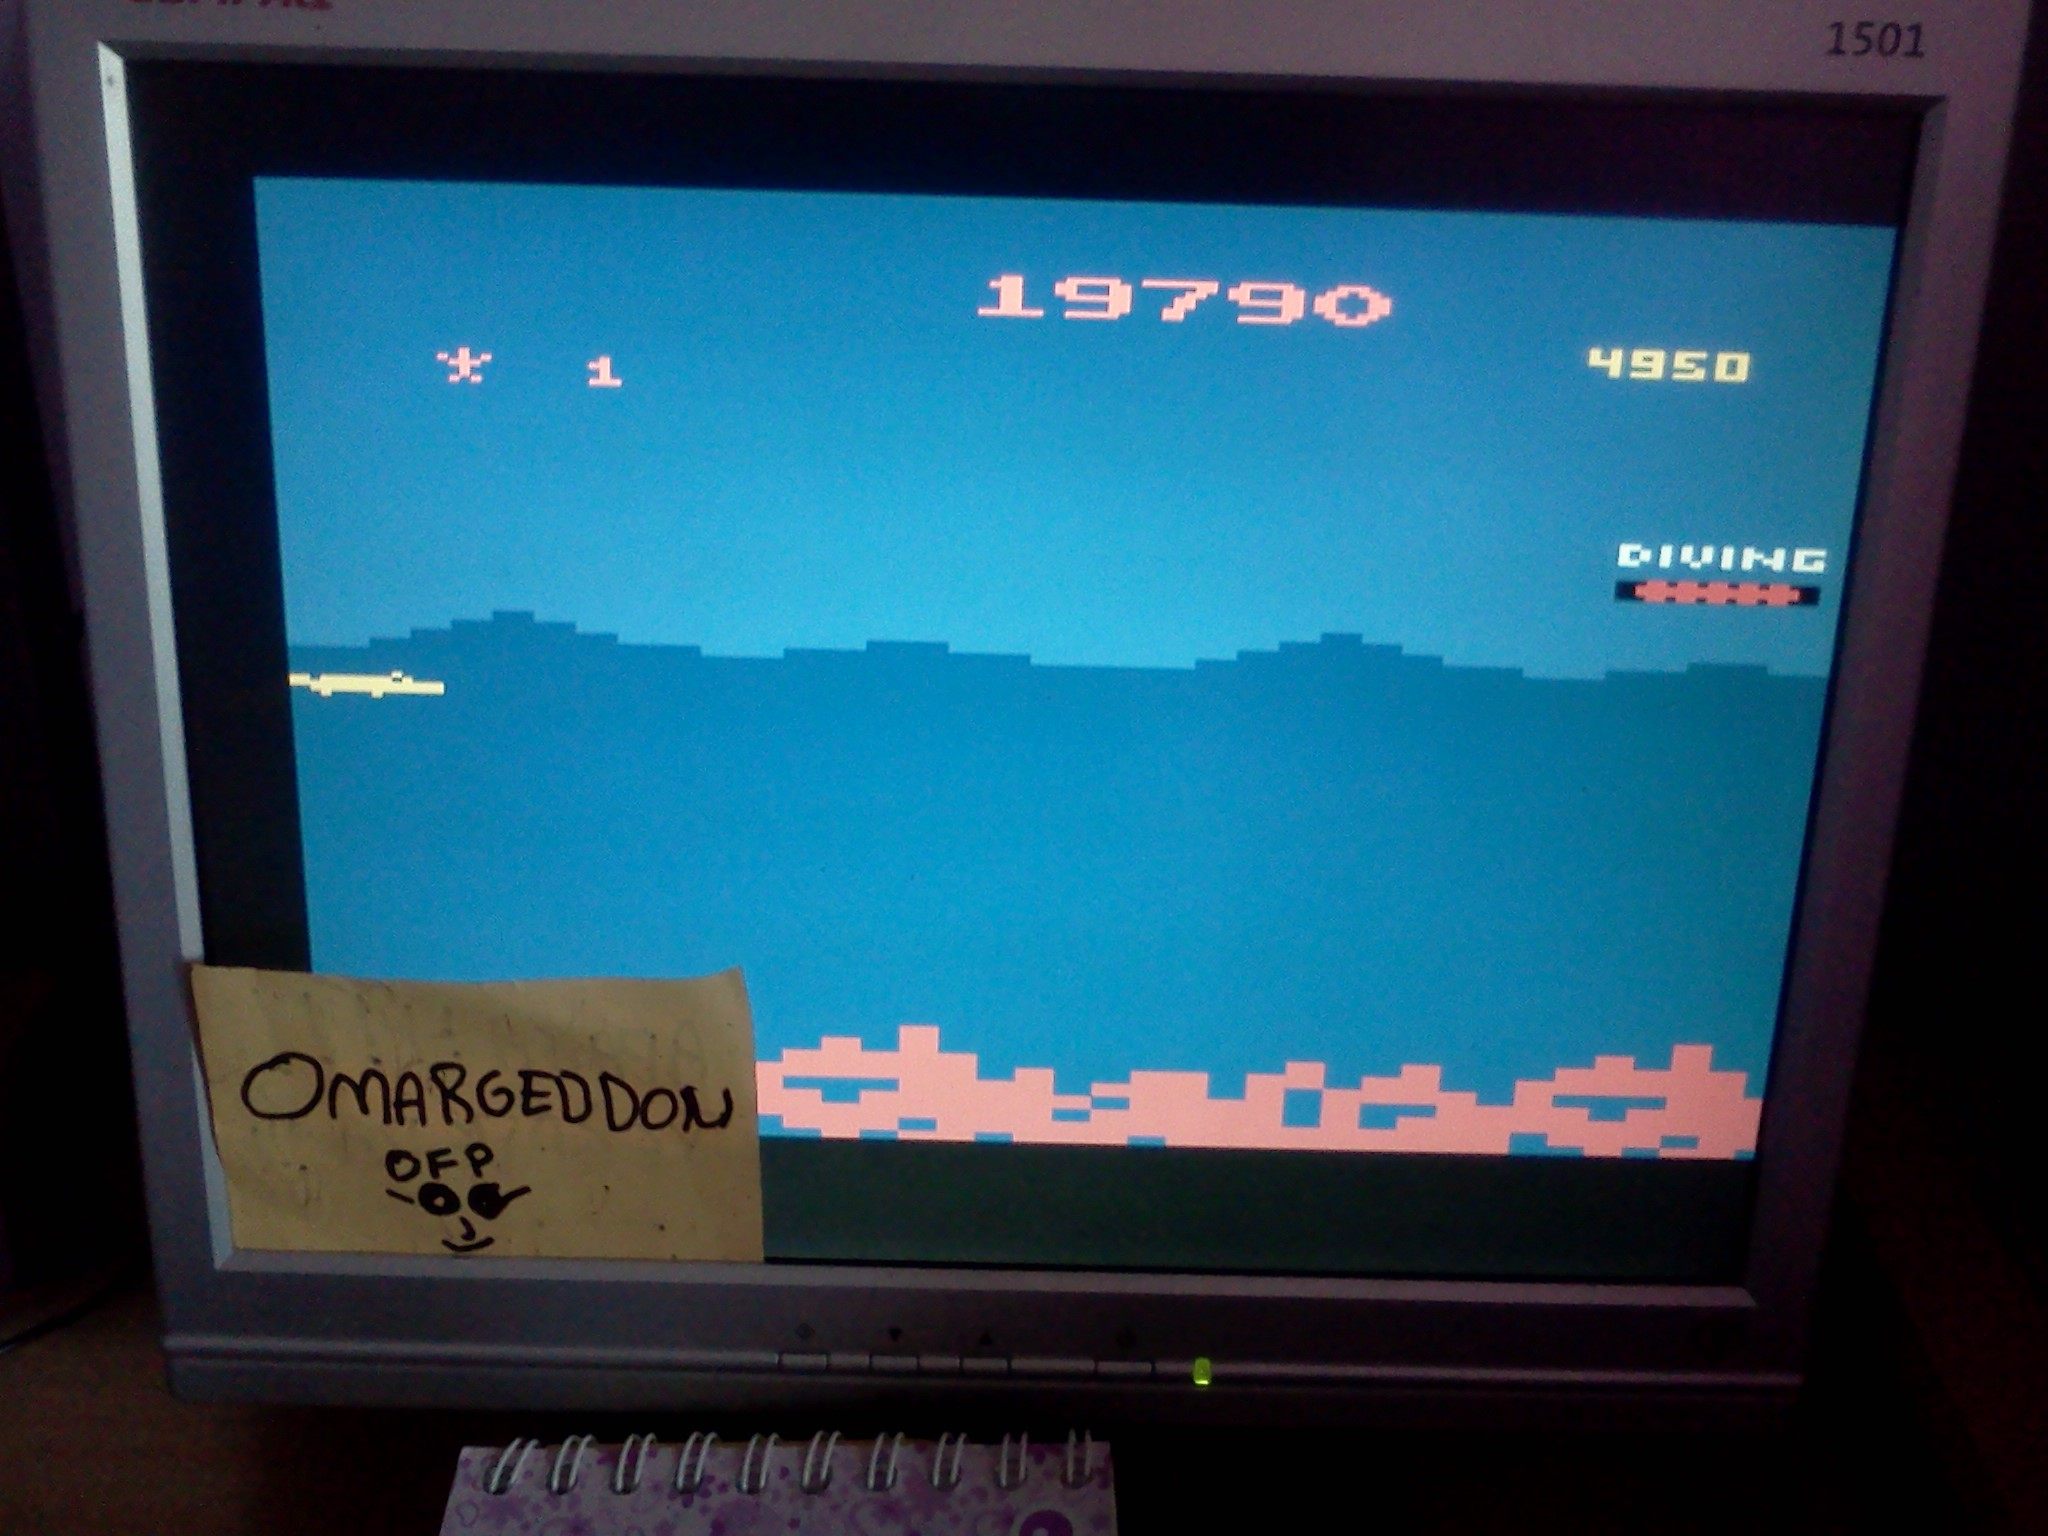 omargeddon: Jungle Hunt (Atari 2600 Emulated) 19,790 points on 2016-07-24 11:39:44